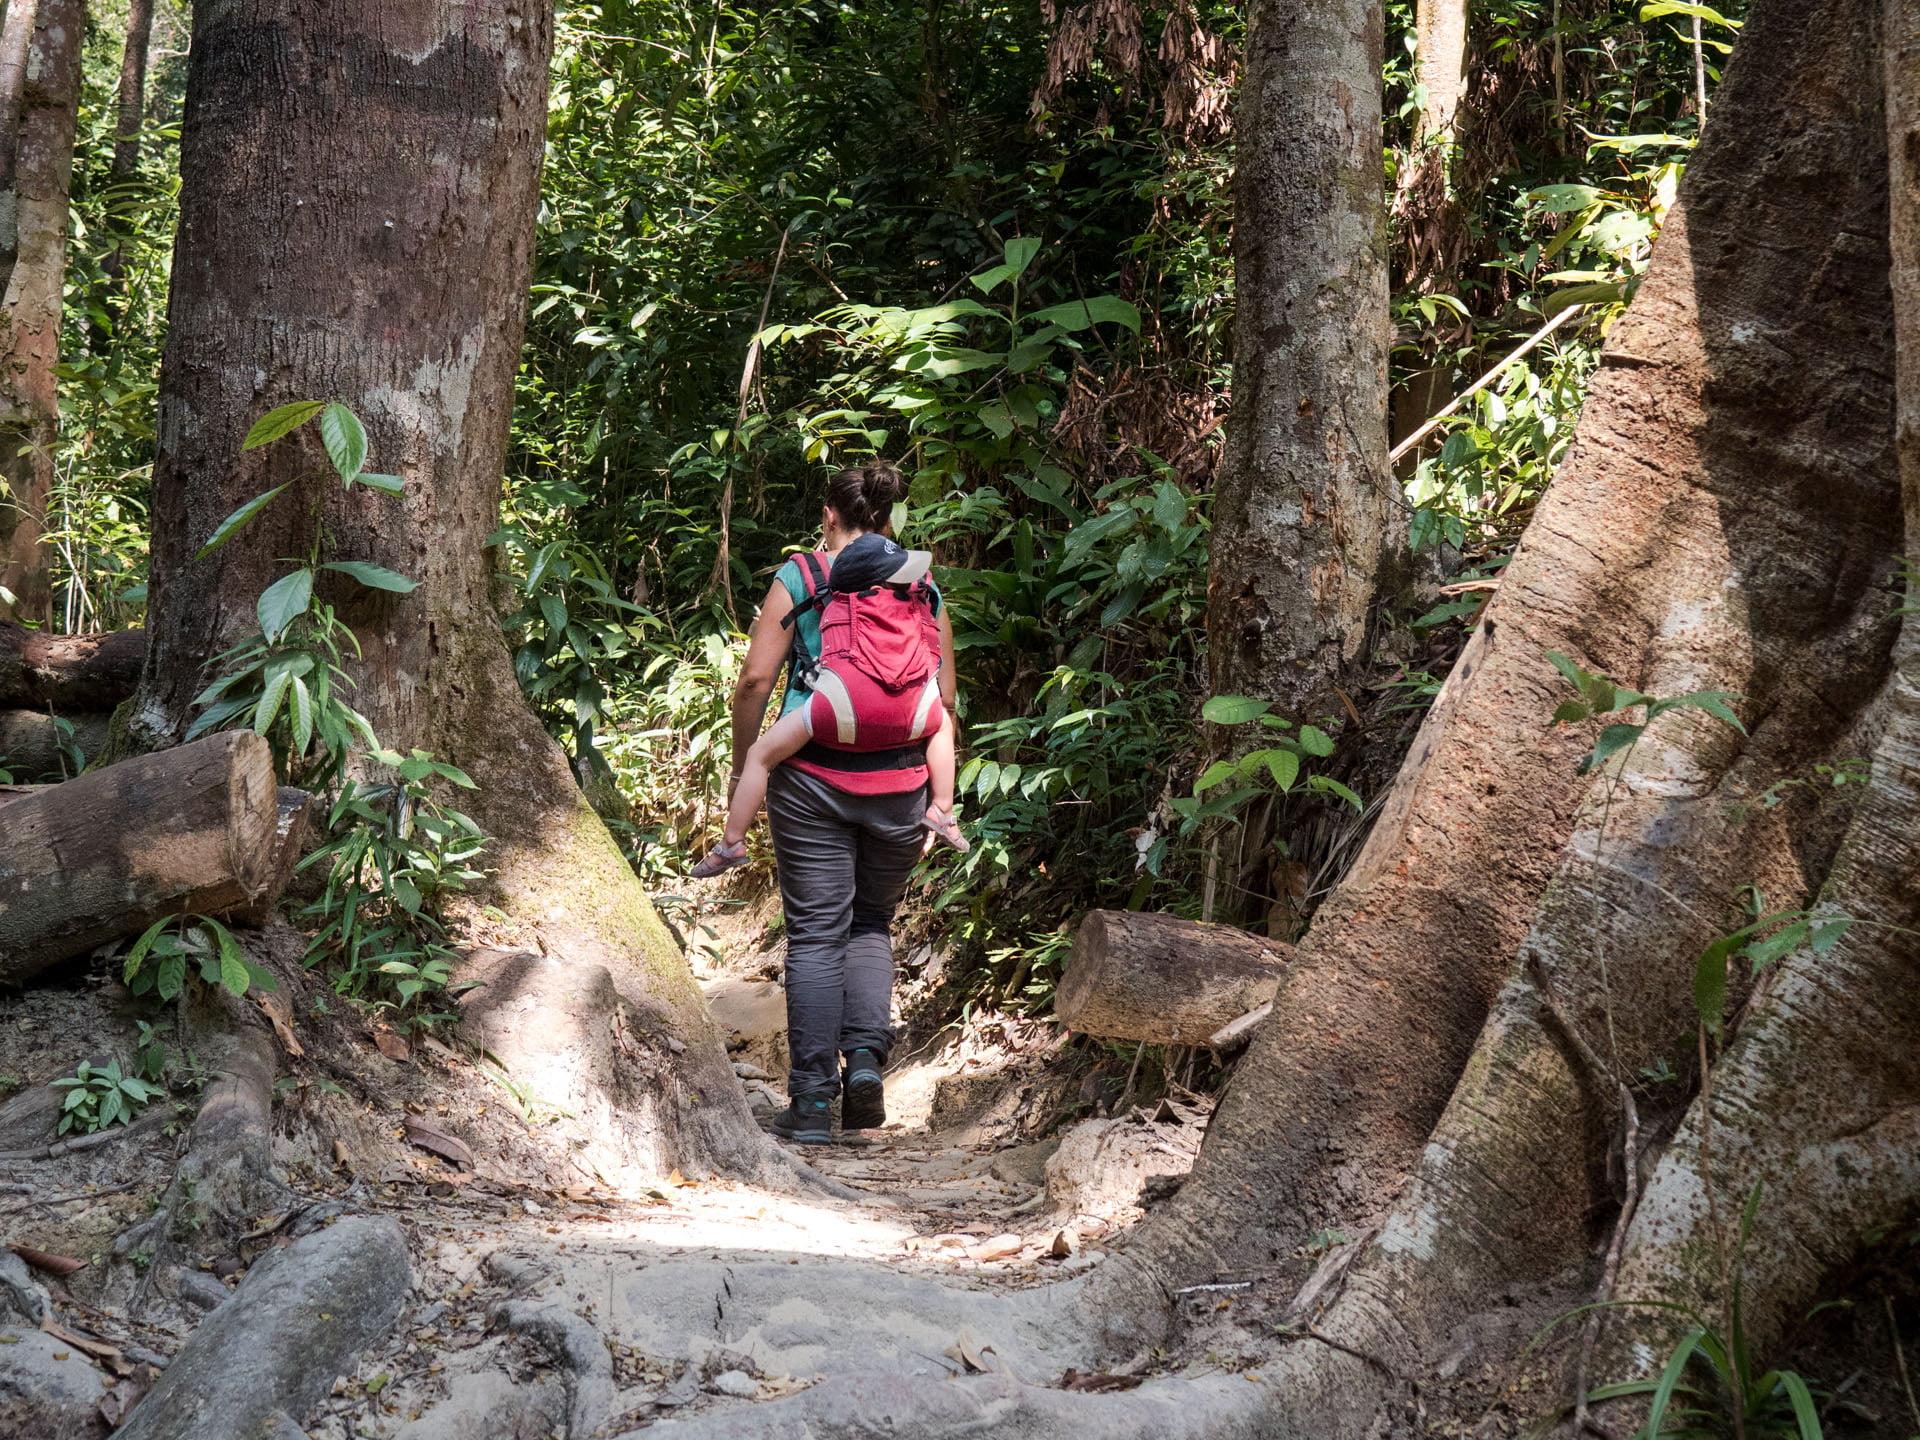 Penang forêt - Les globe blogueurs - blog voyage nature